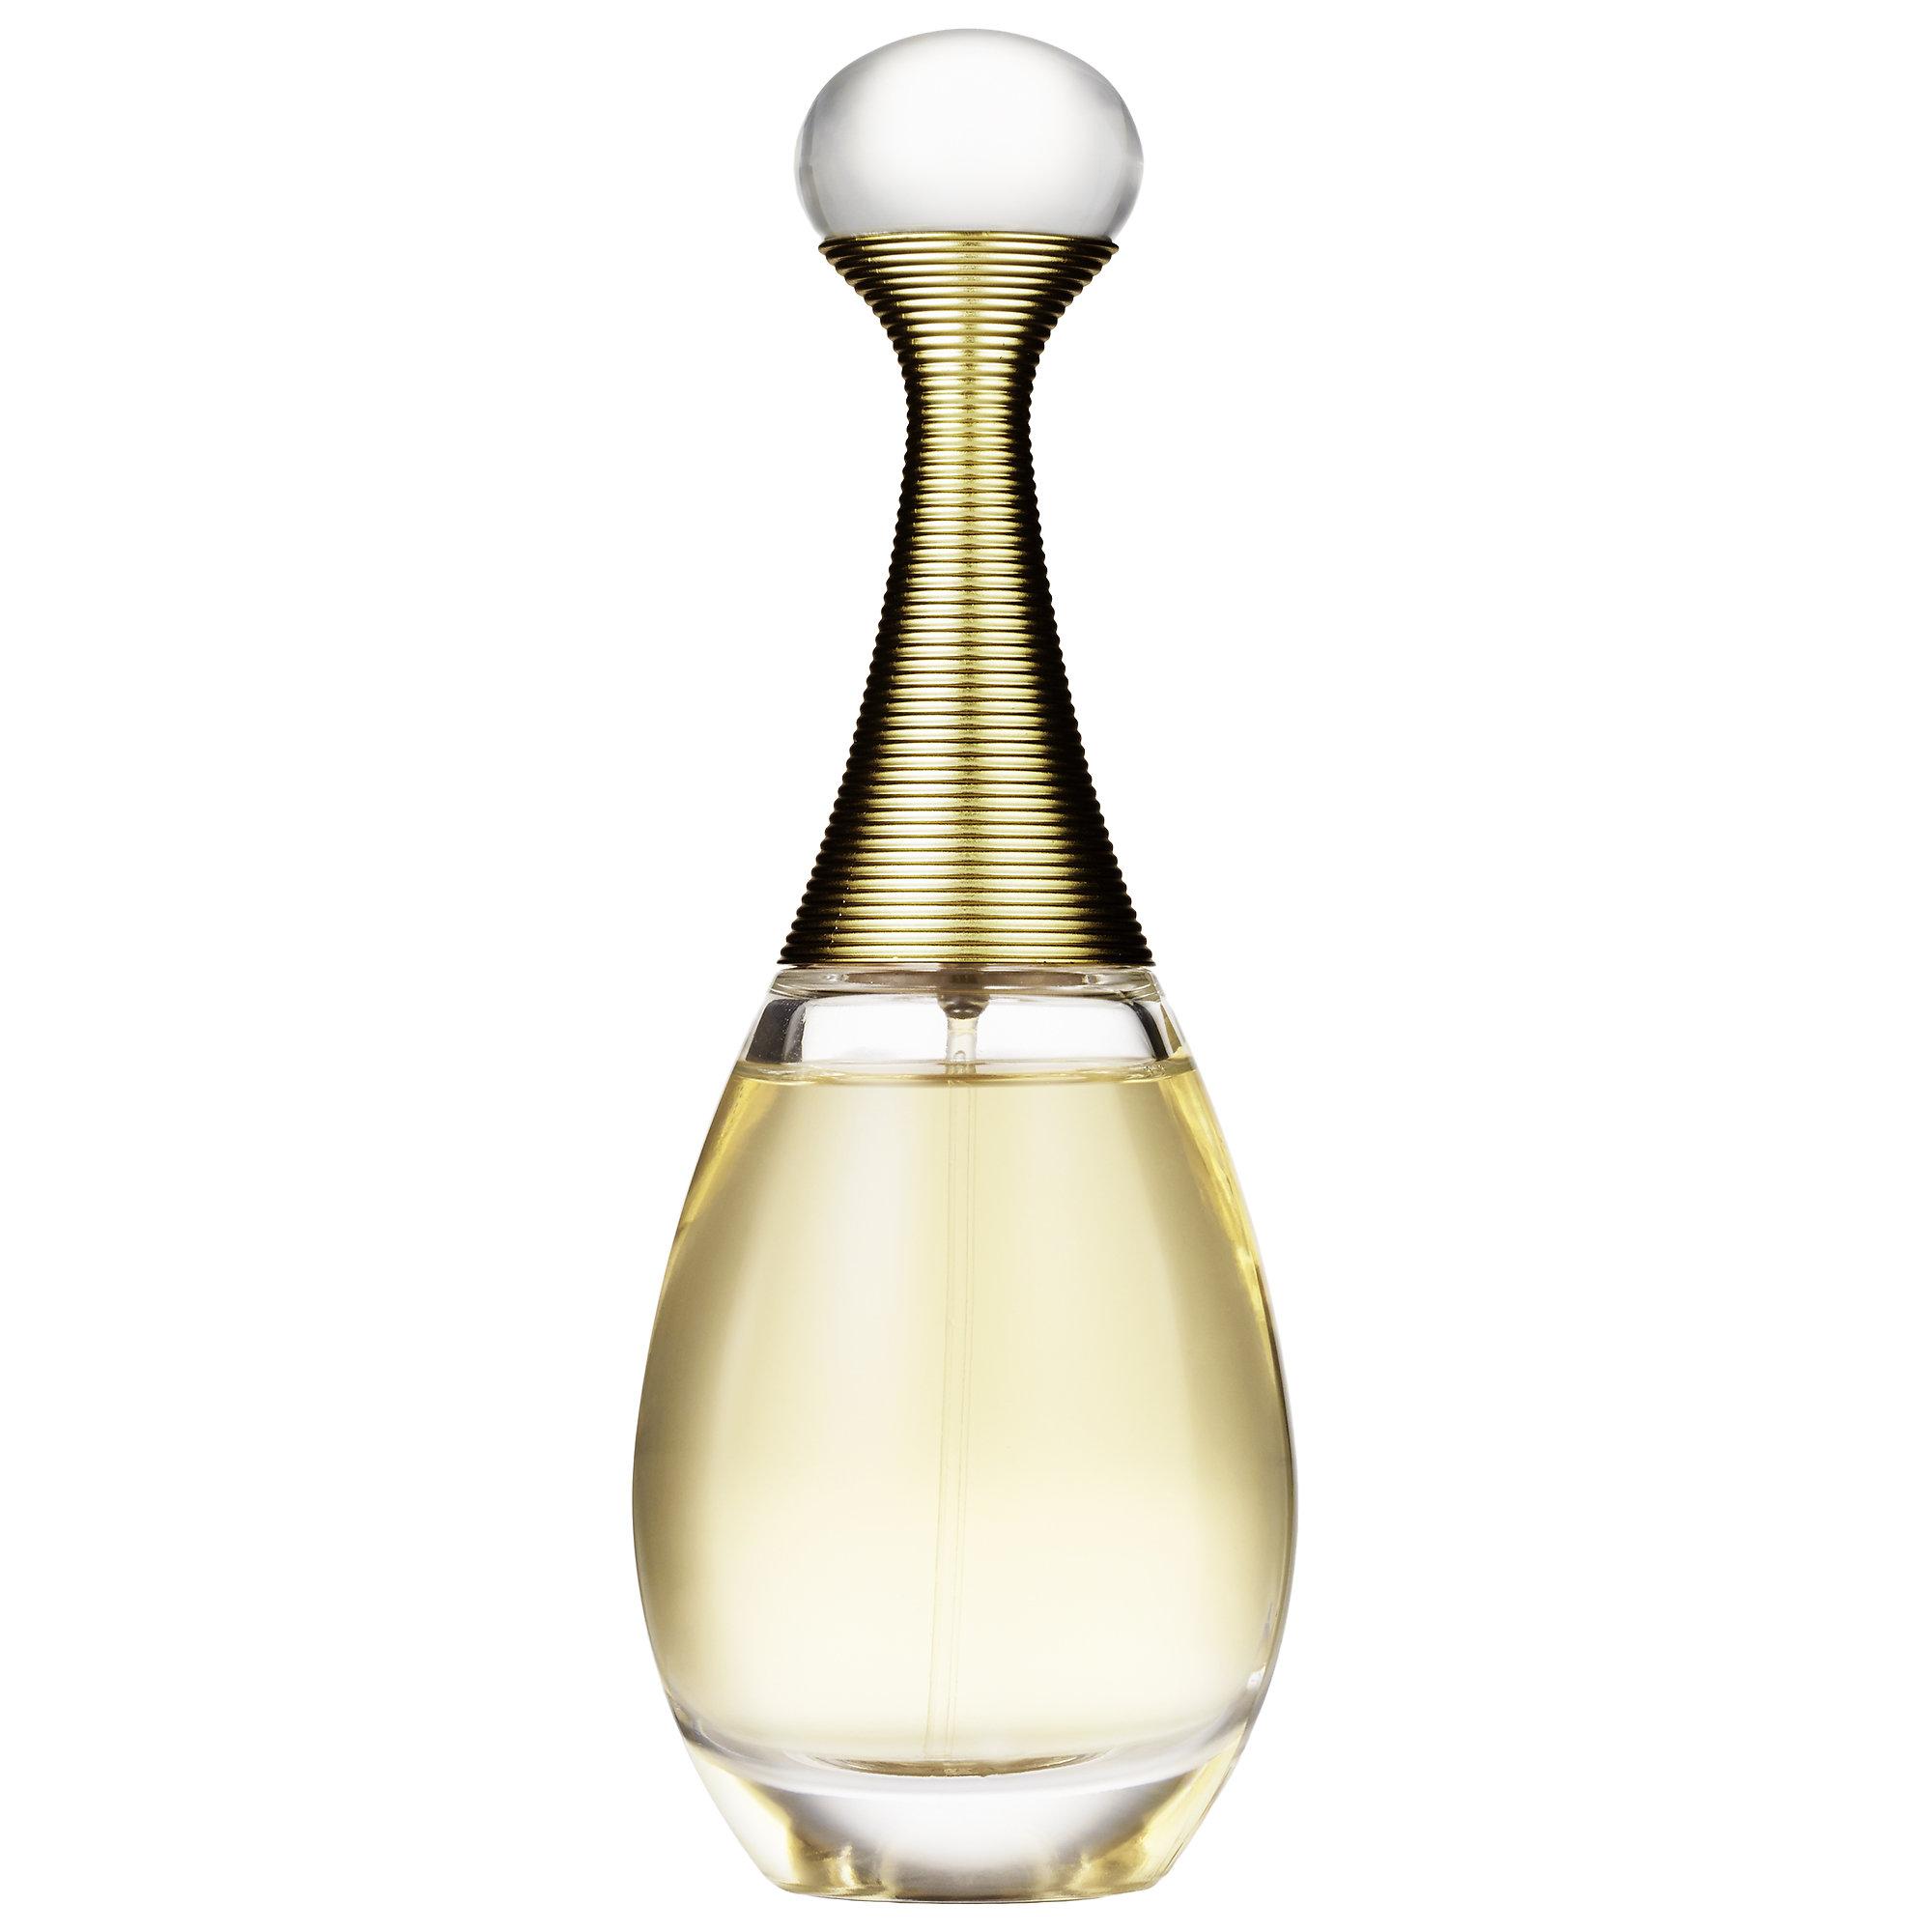 j 39 adore by christian dior women 39 s eau de parfum spray 3 4 oz check back soon blinq